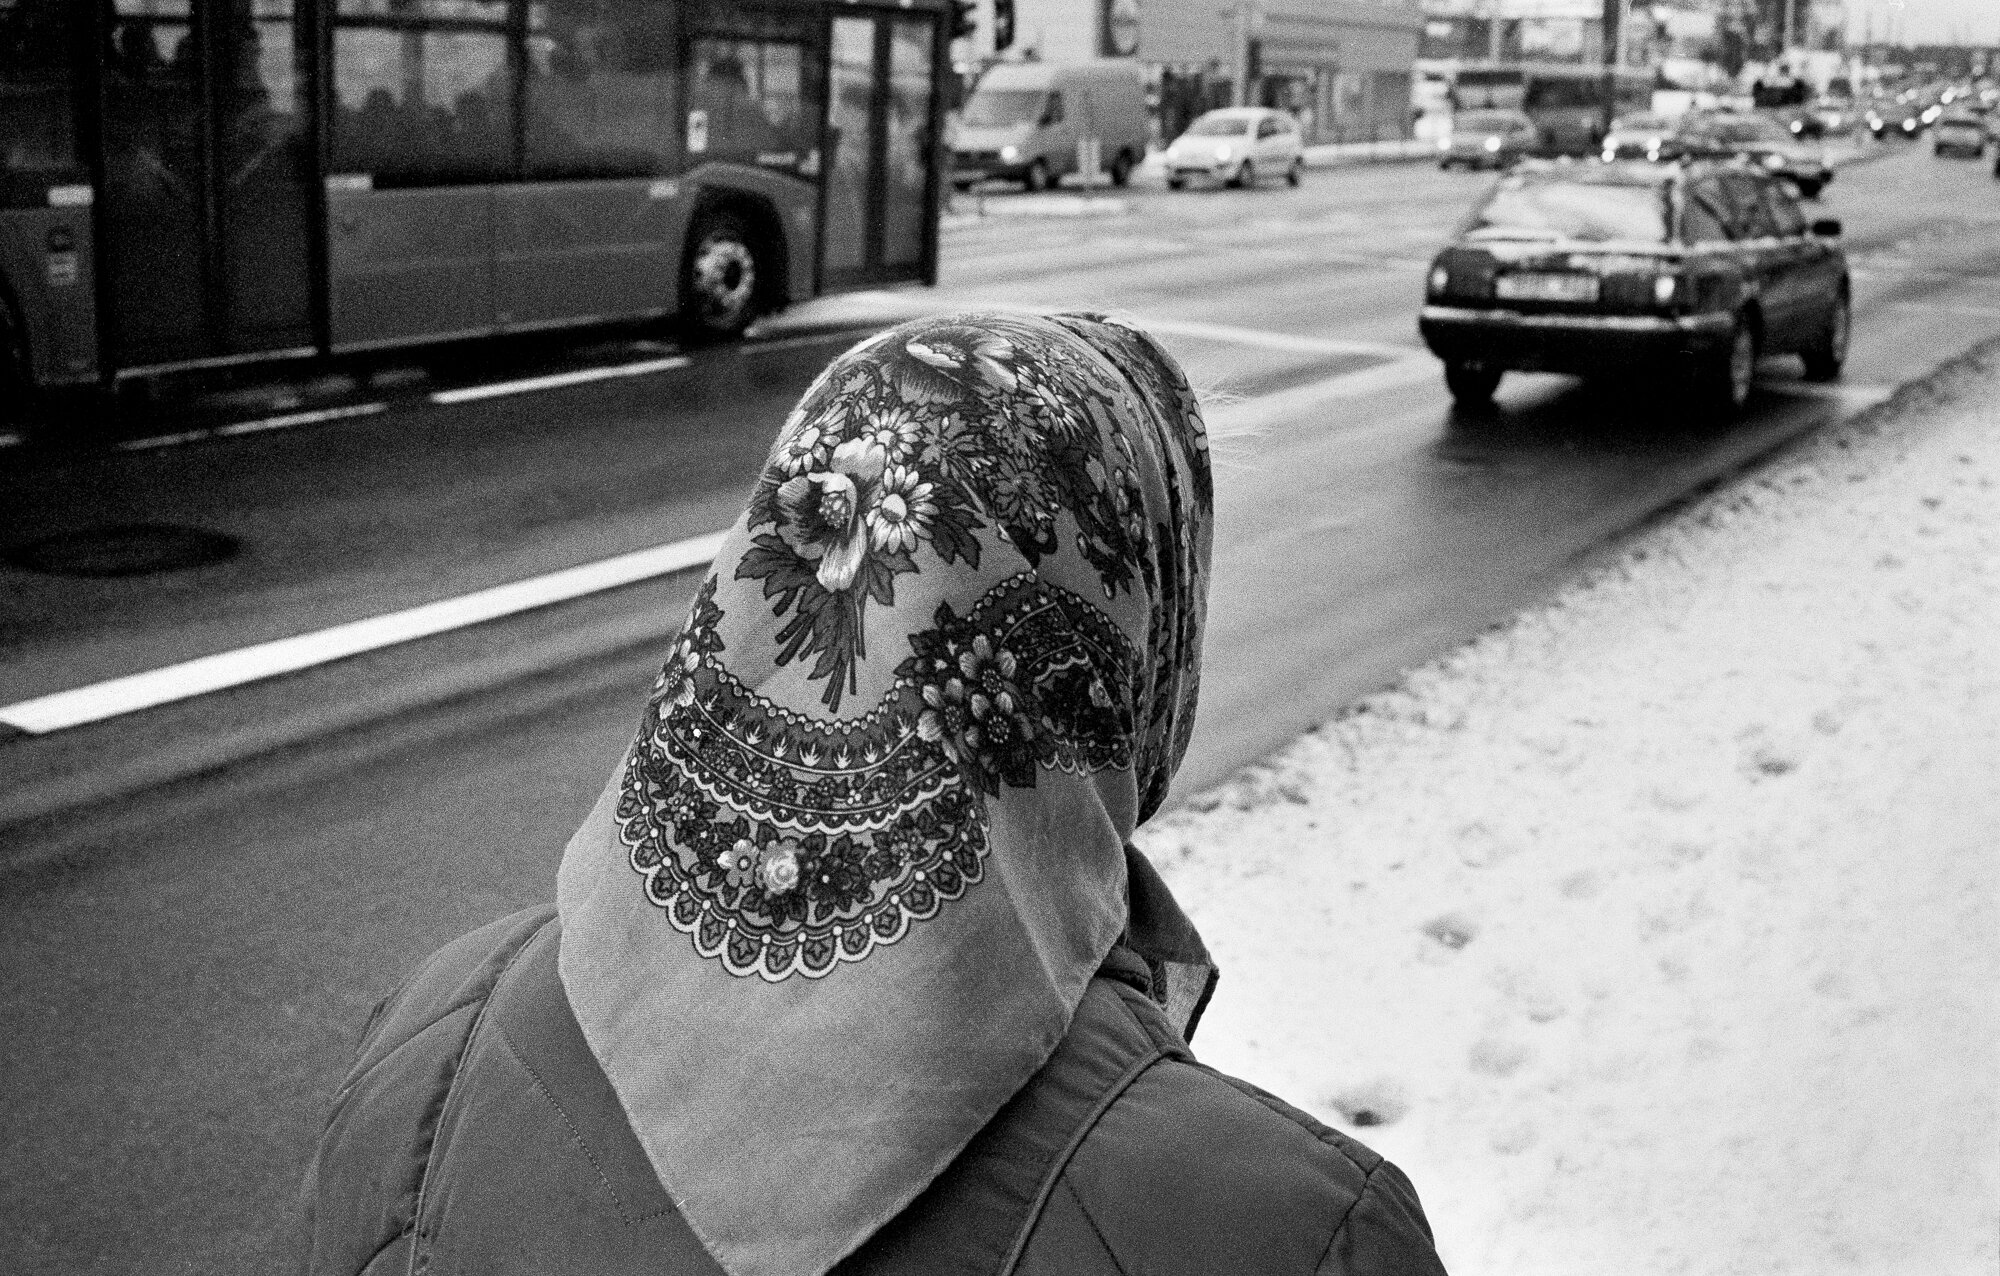 Ignas_Winter-9.jpg